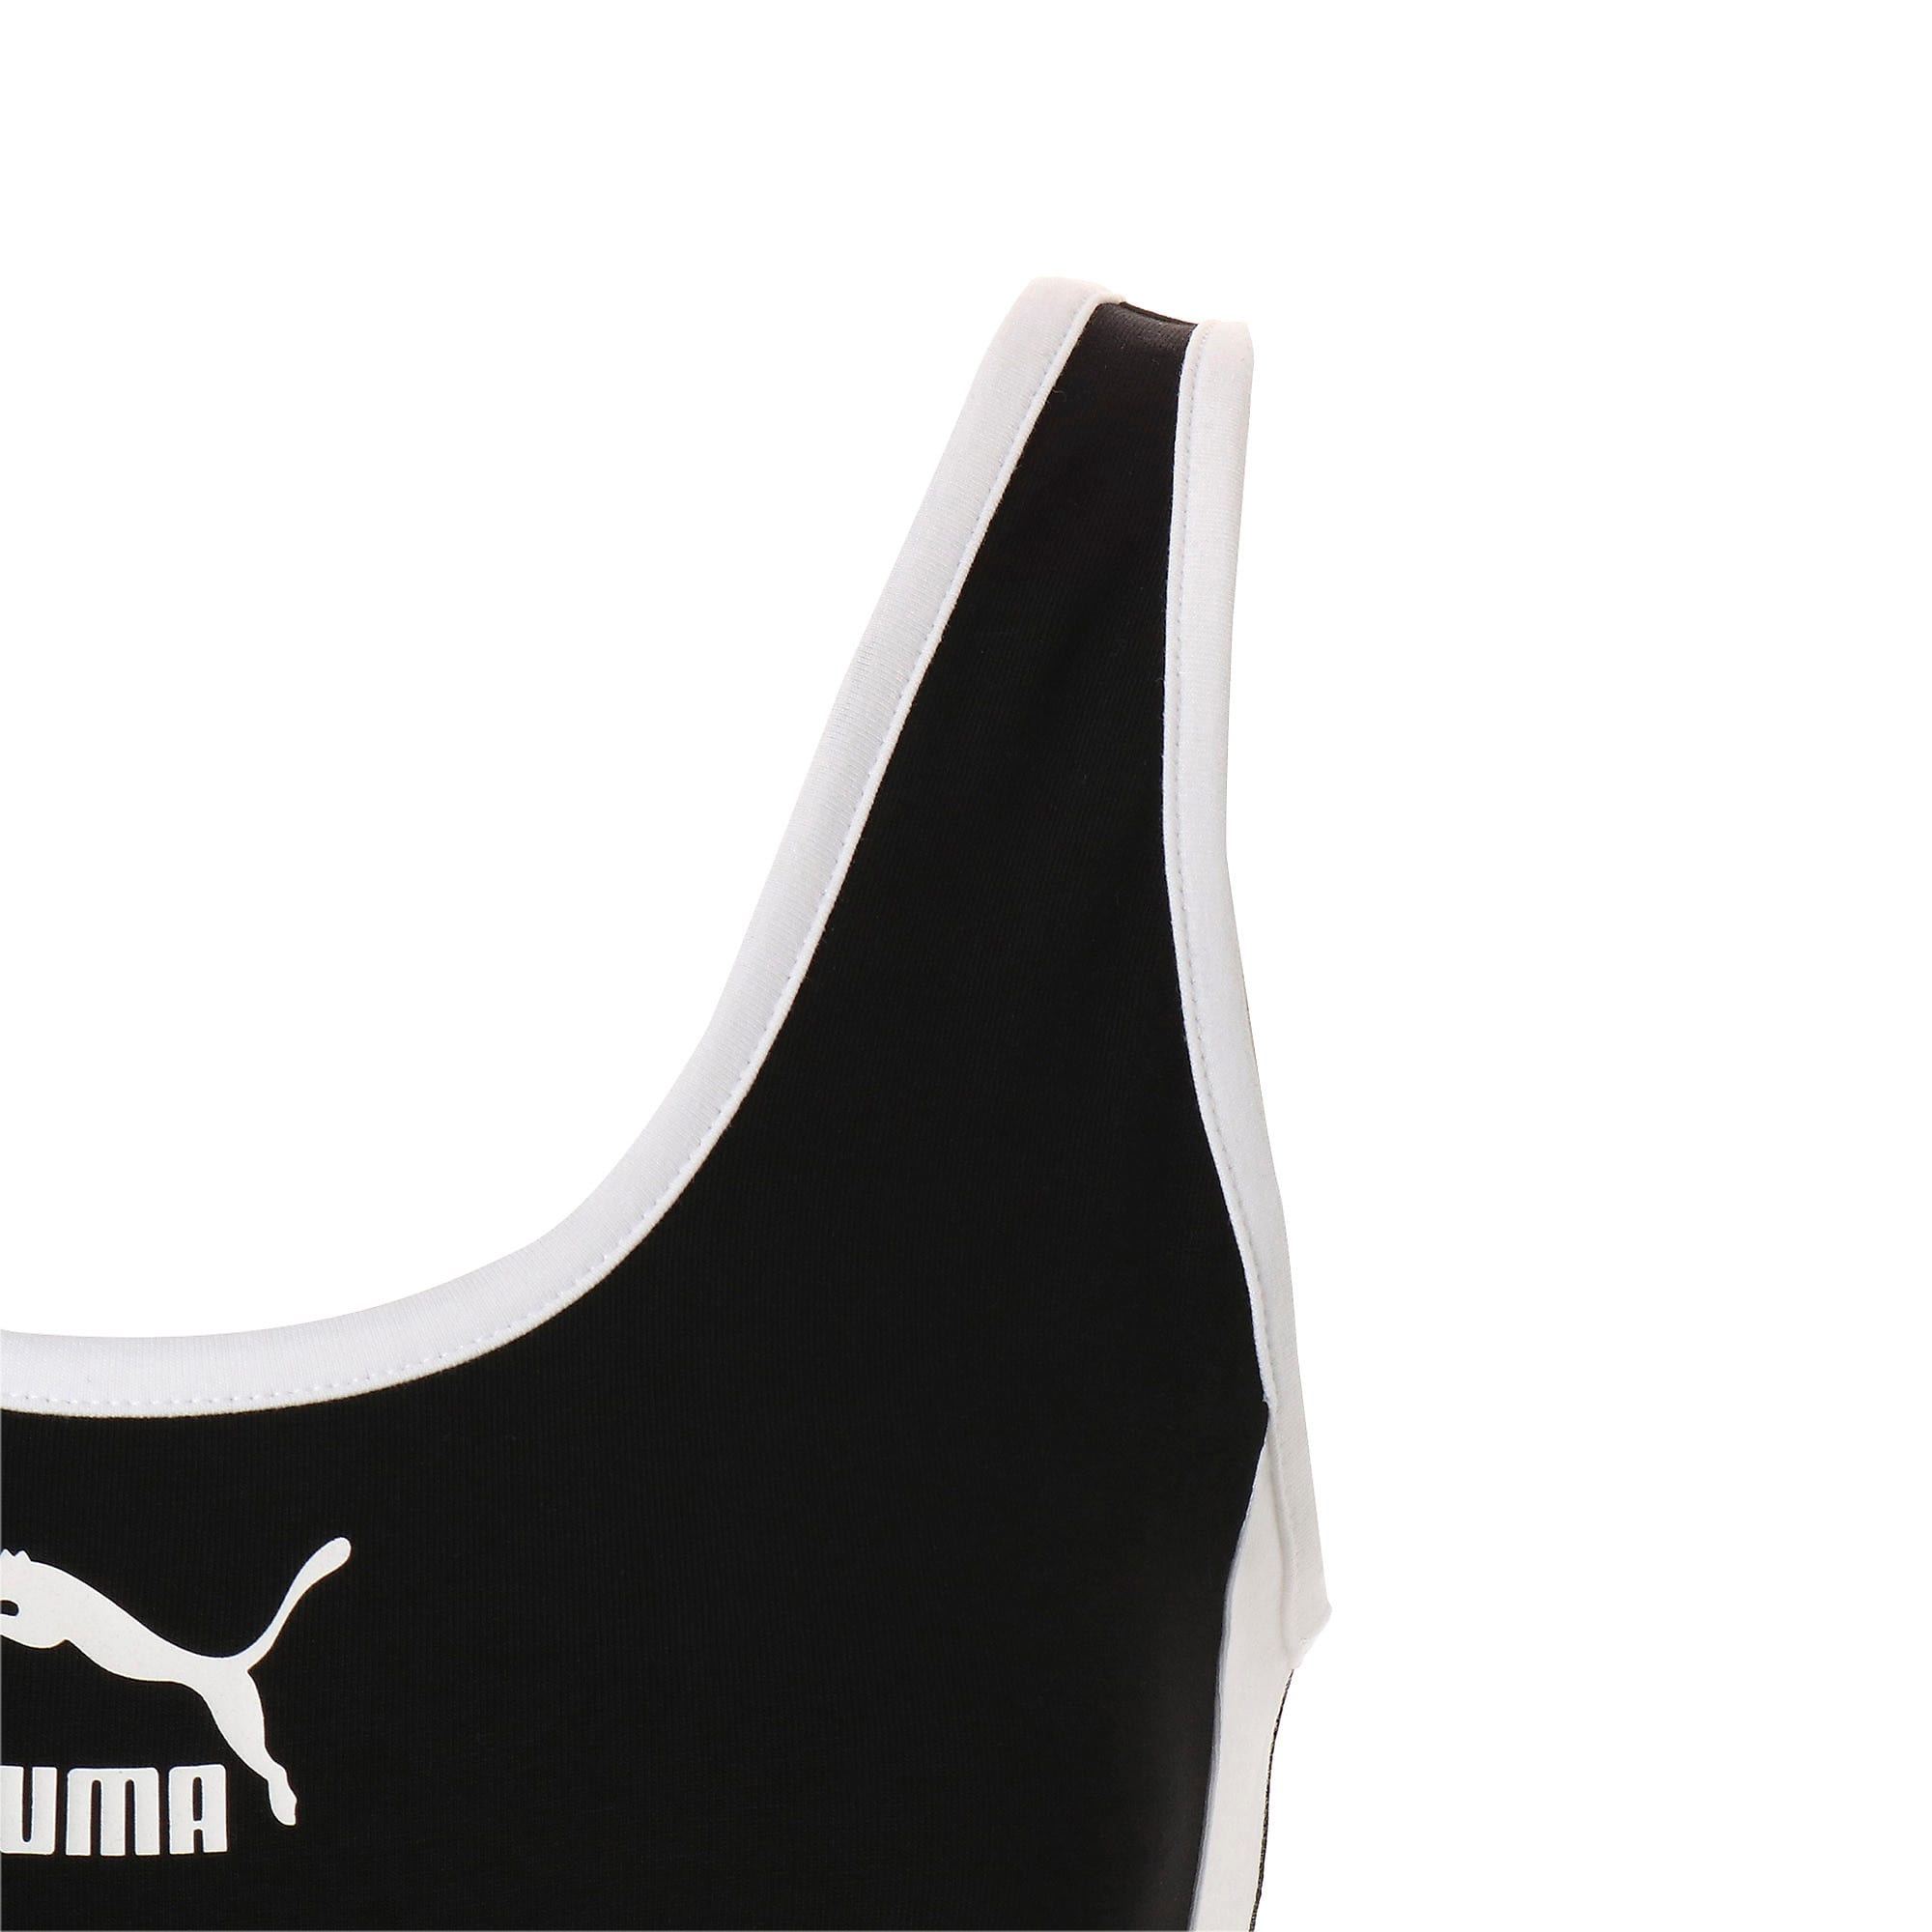 Thumbnail 5 of CLASSICS T7 ウィメンズ ボディスーツ, Cotton Black, medium-JPN